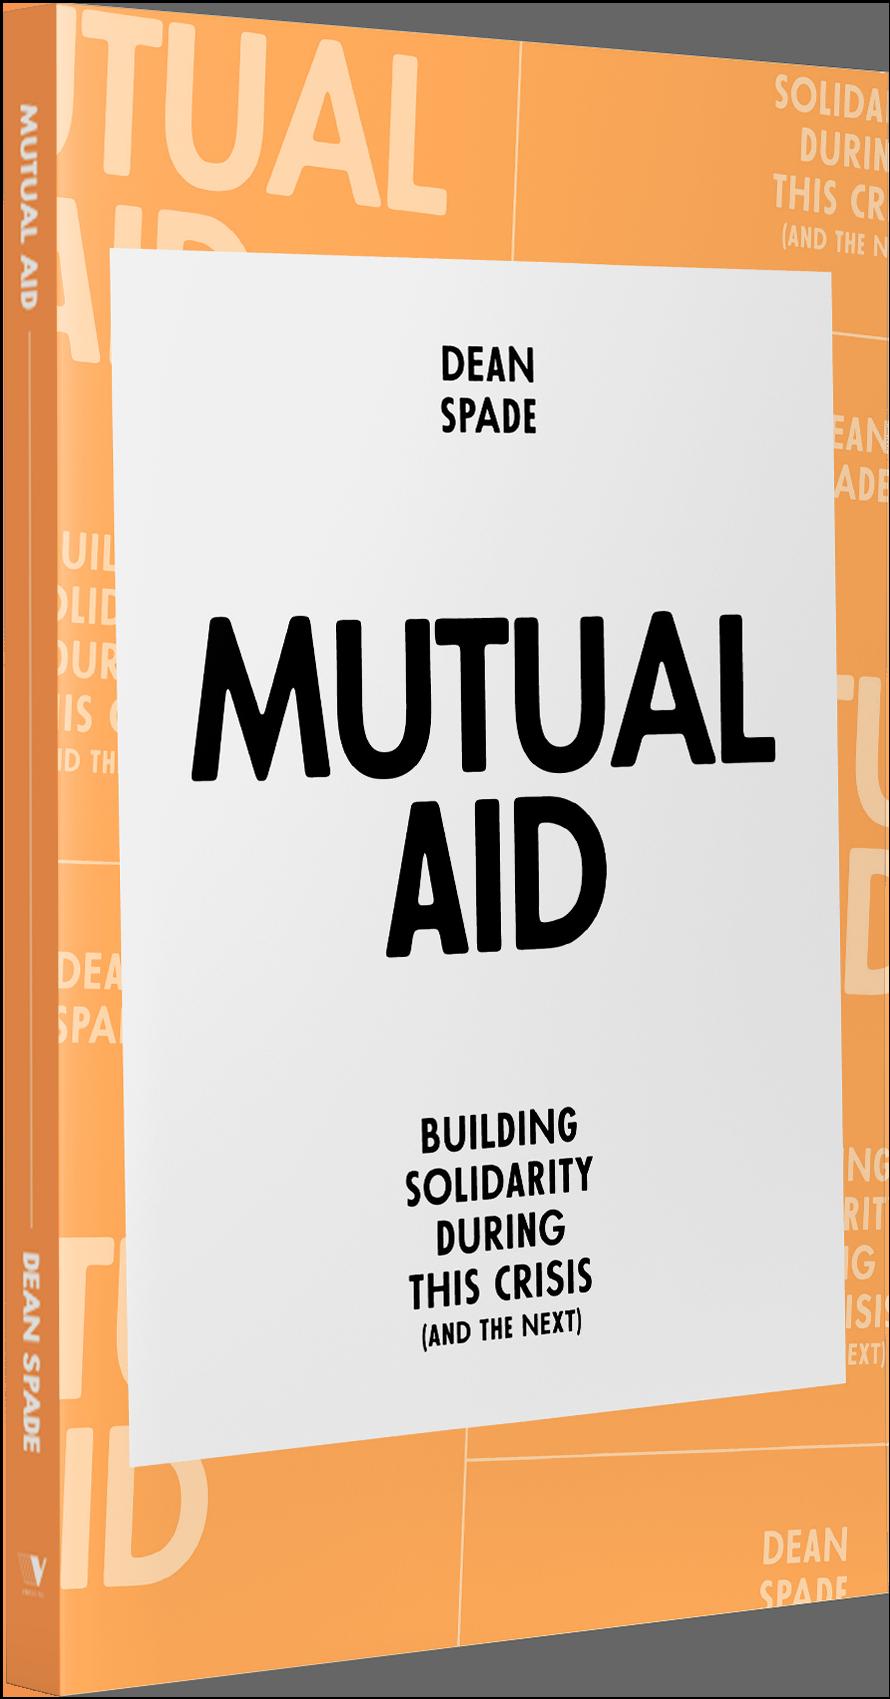 Spade_mutual_aid